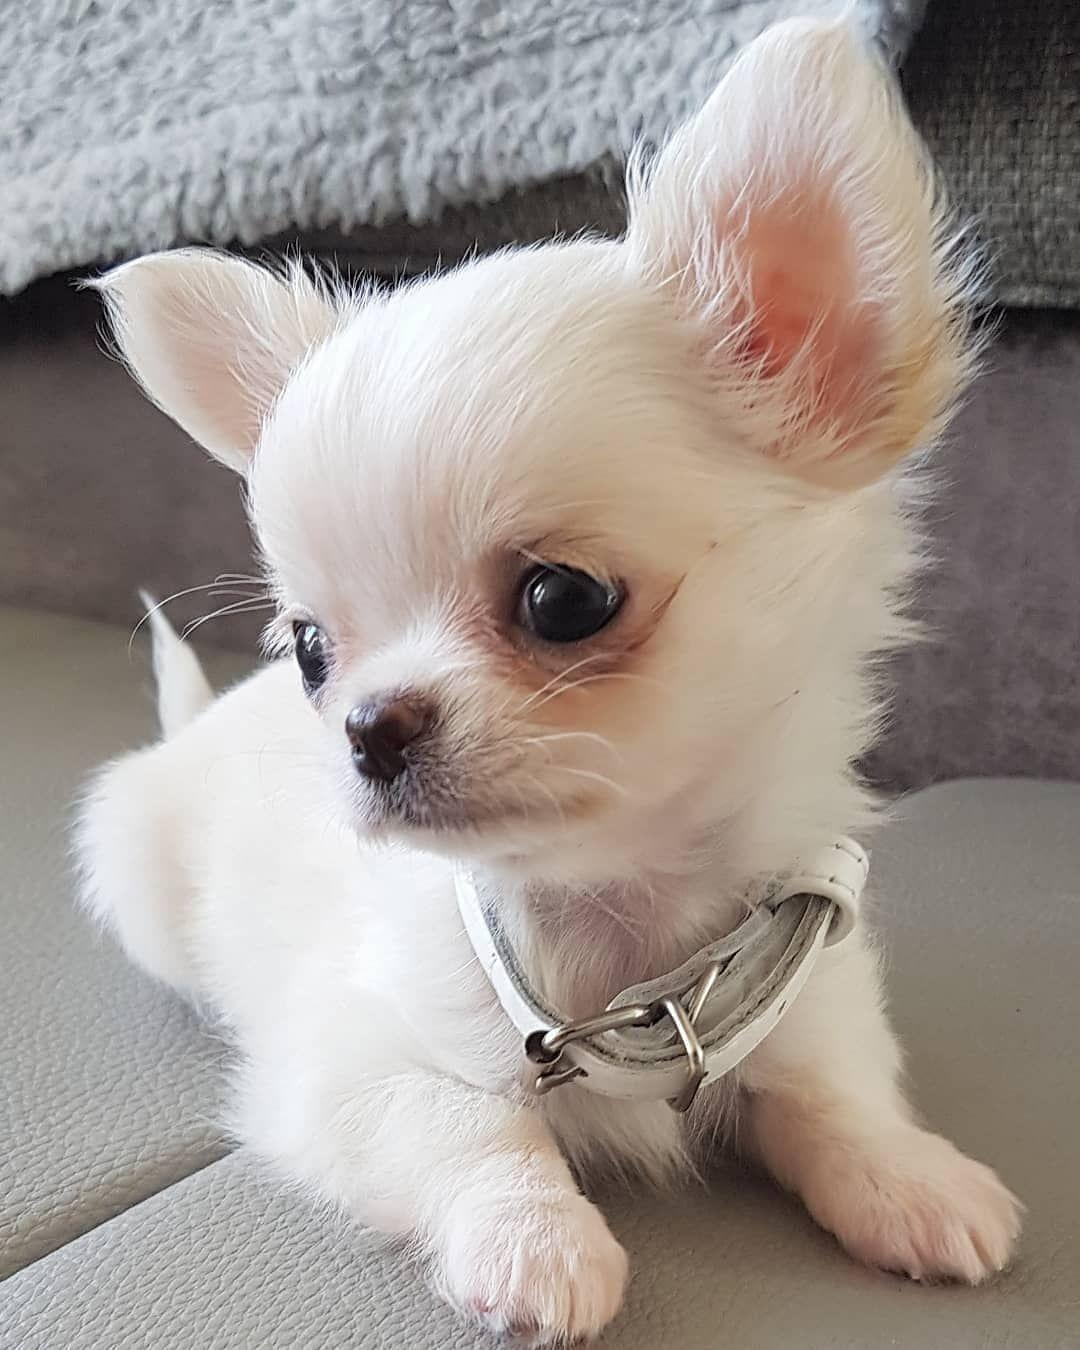 Pin Van Monique Skerka Op Honden Cute Dogs Chihuahua